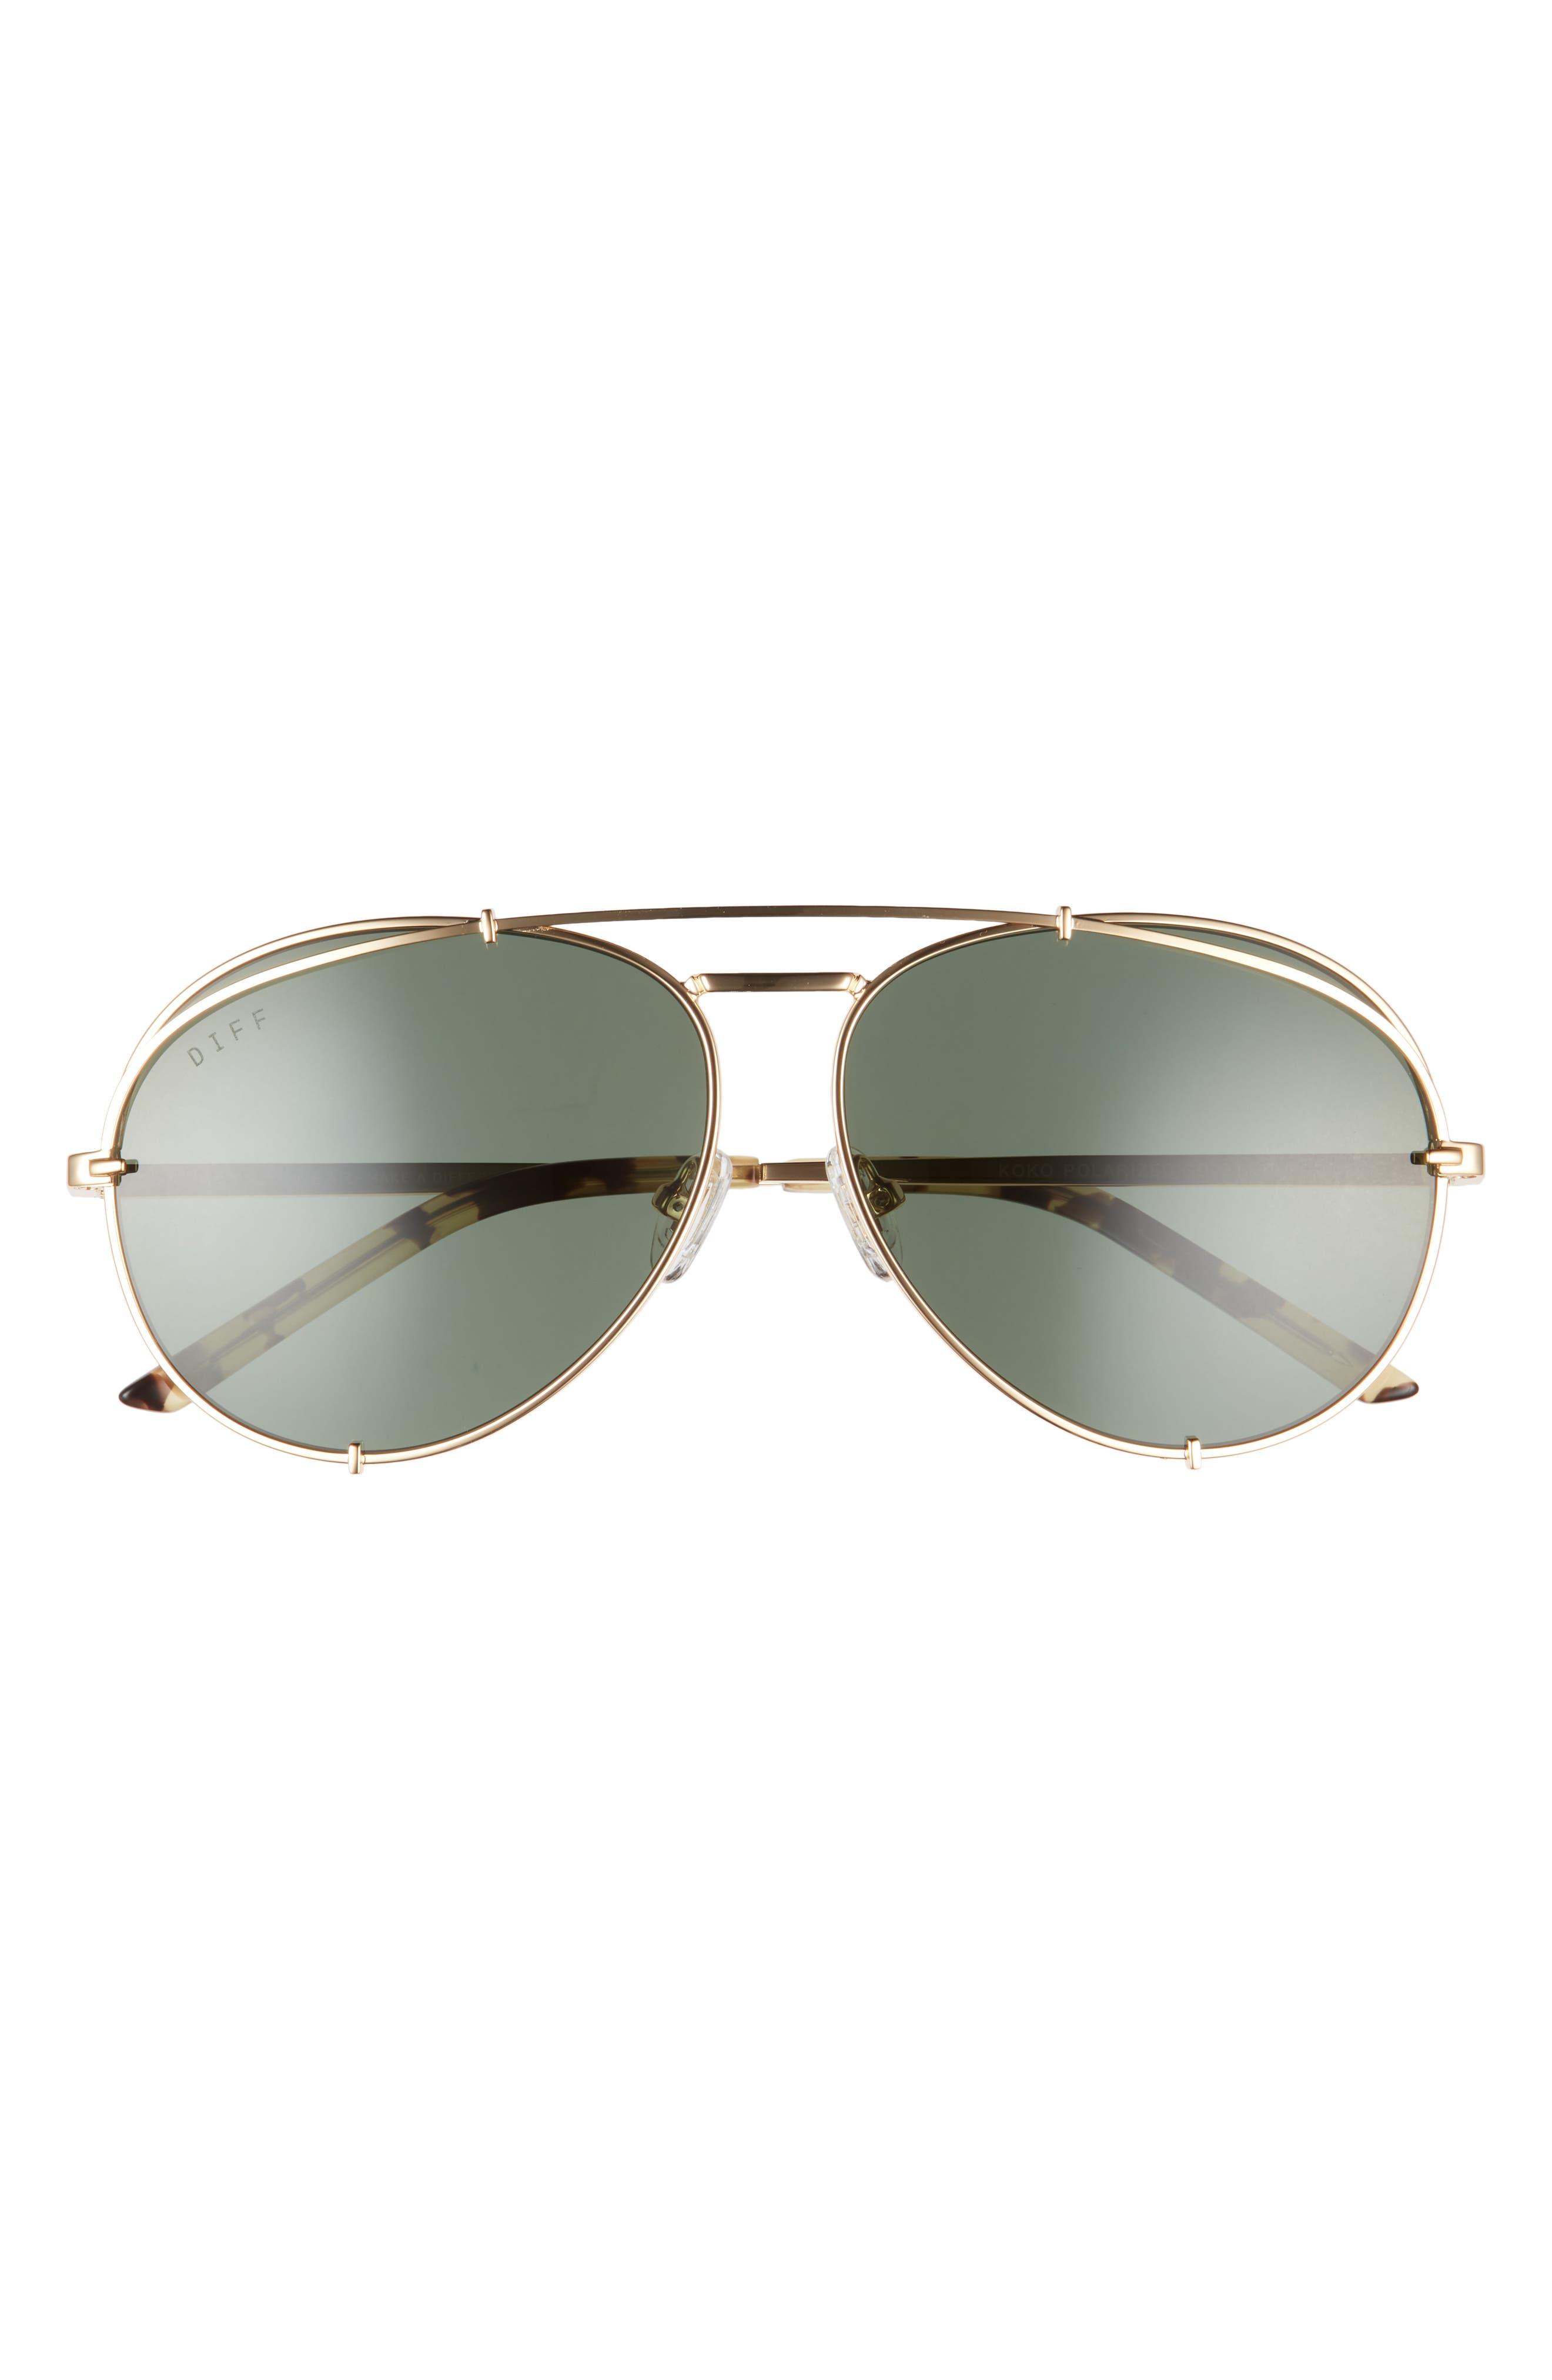 Koko 63mm Oversize Polarized Aviator Sunglasses